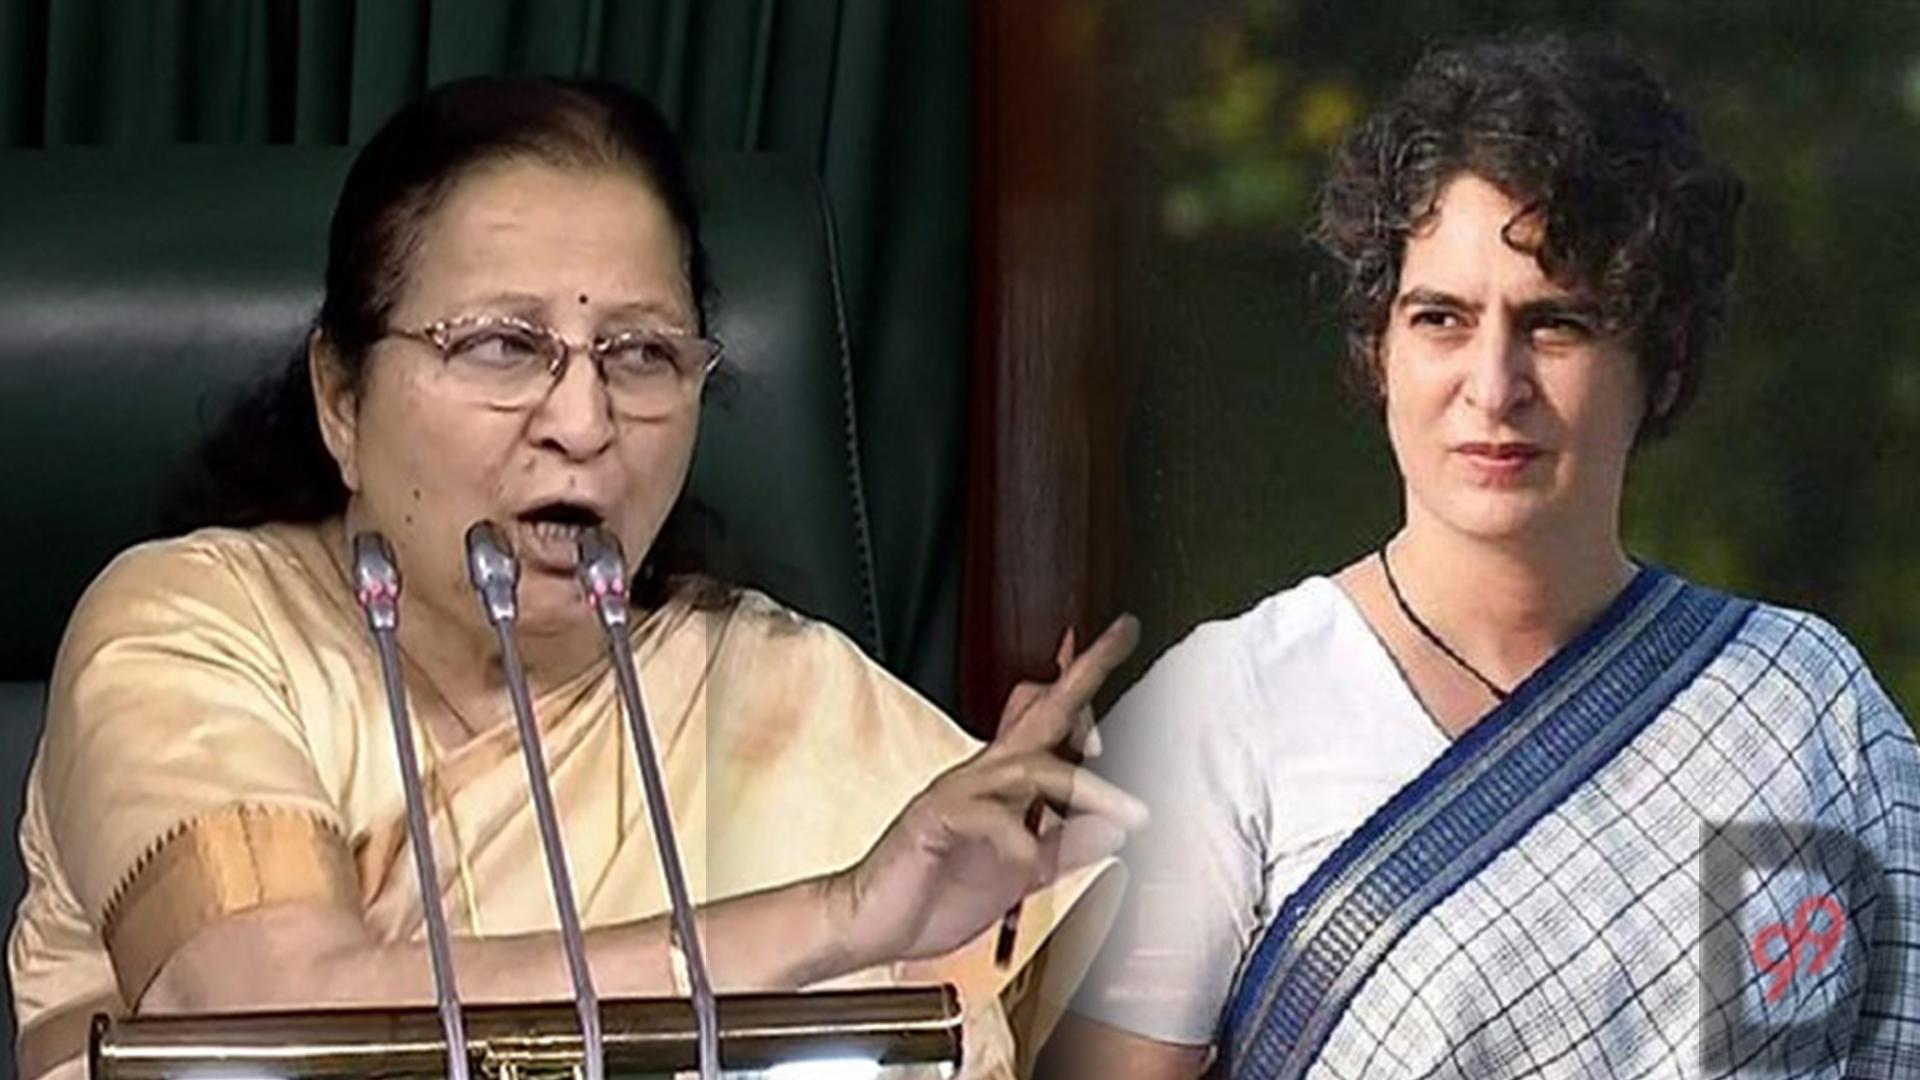 Lok Sabha speaker commented on Priyanka's entry, faced backlash from Congress